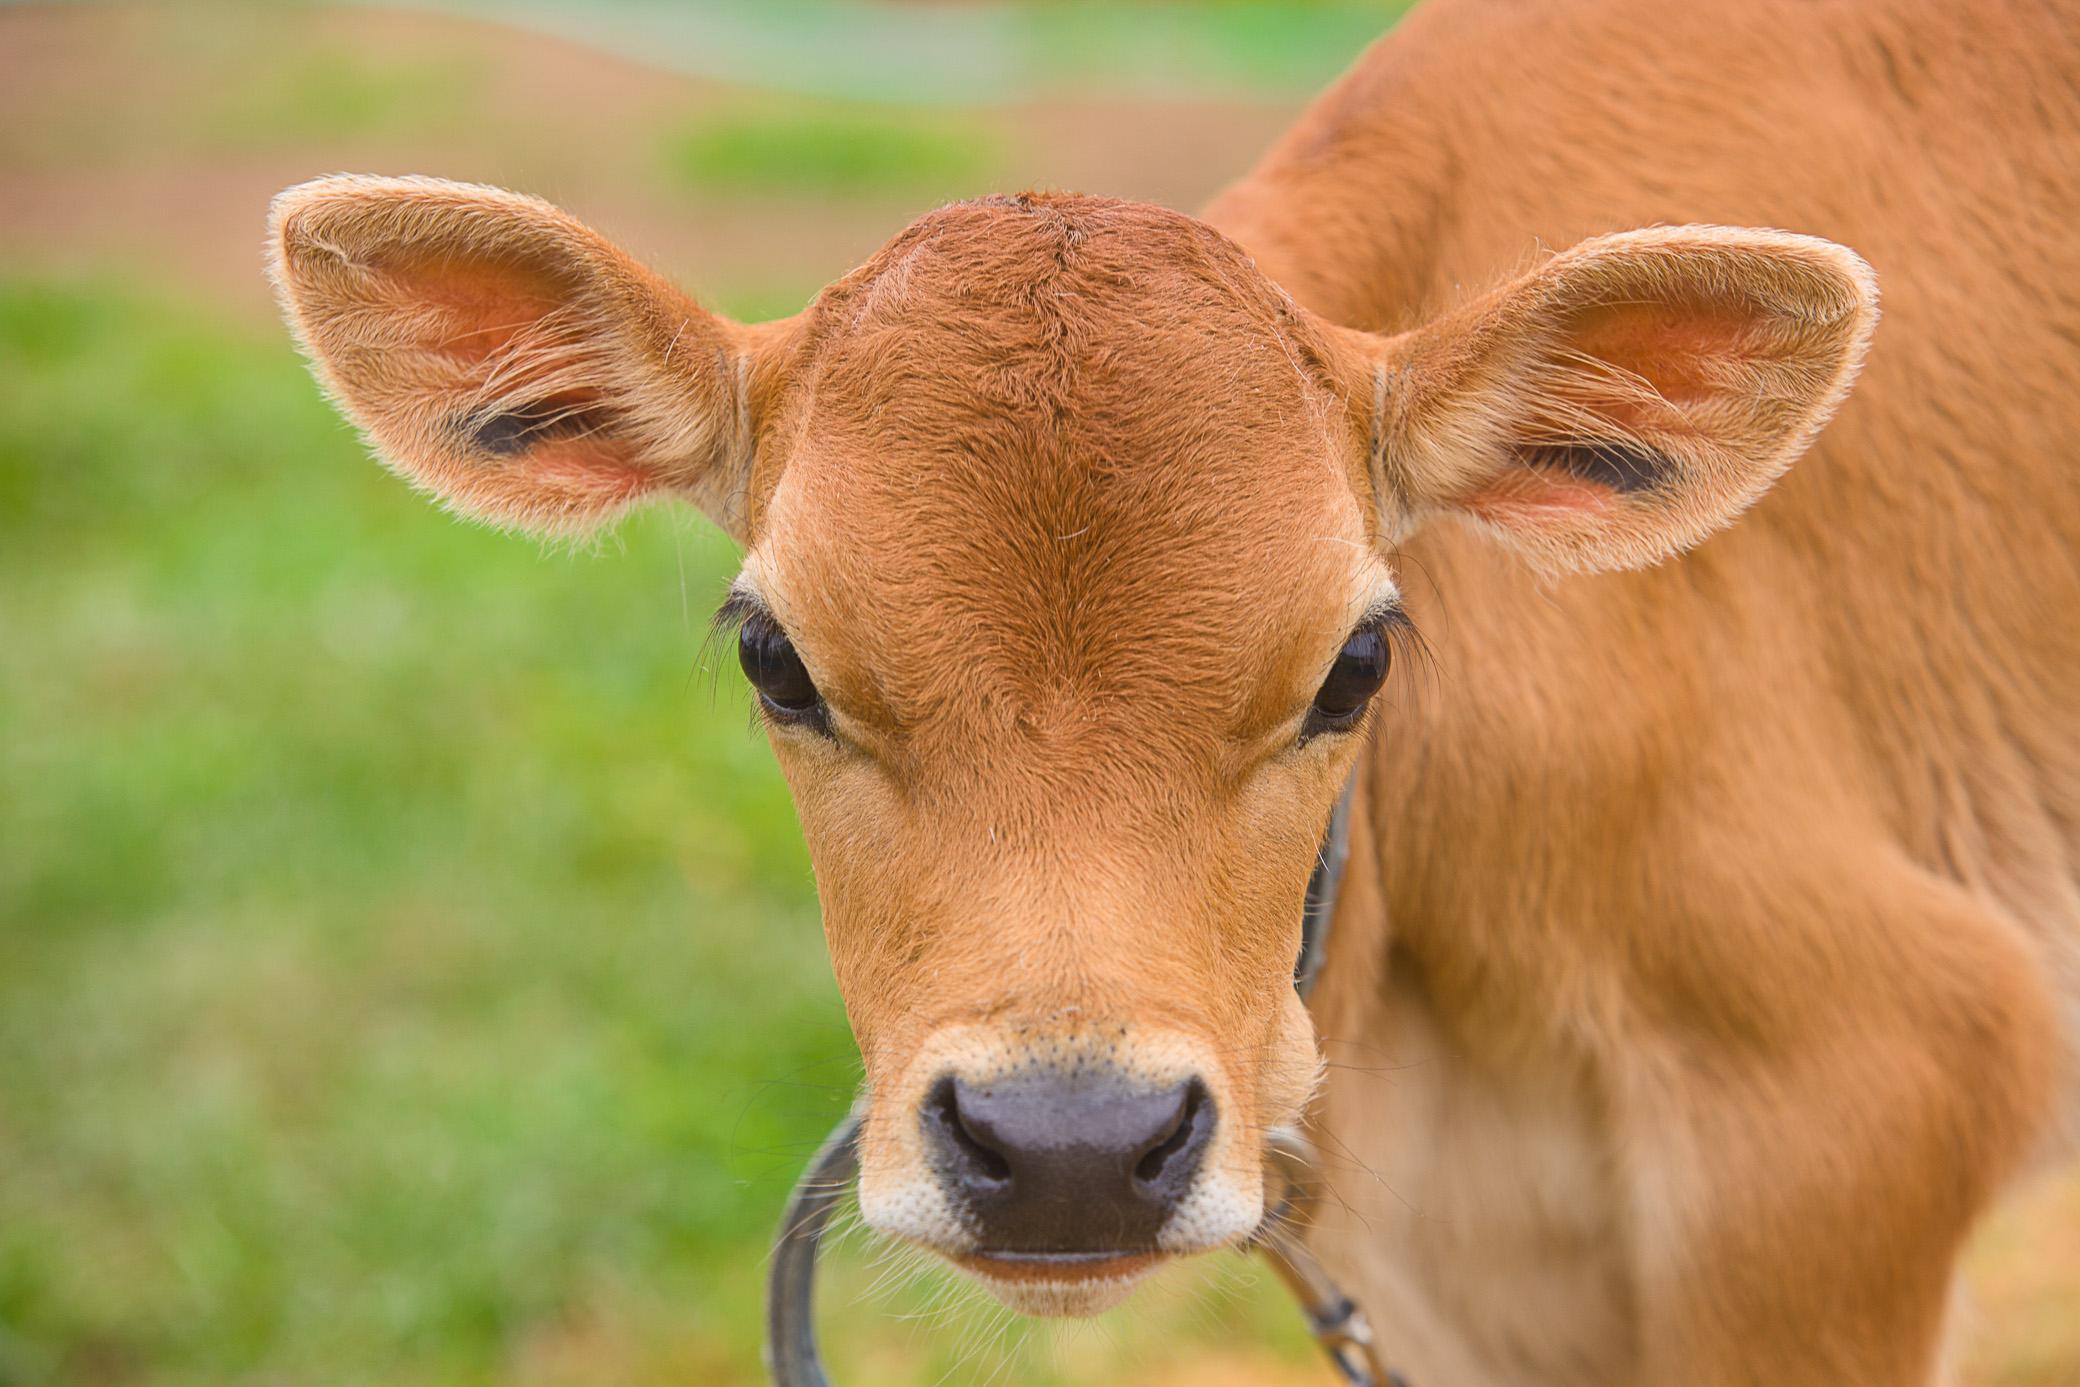 Young calf